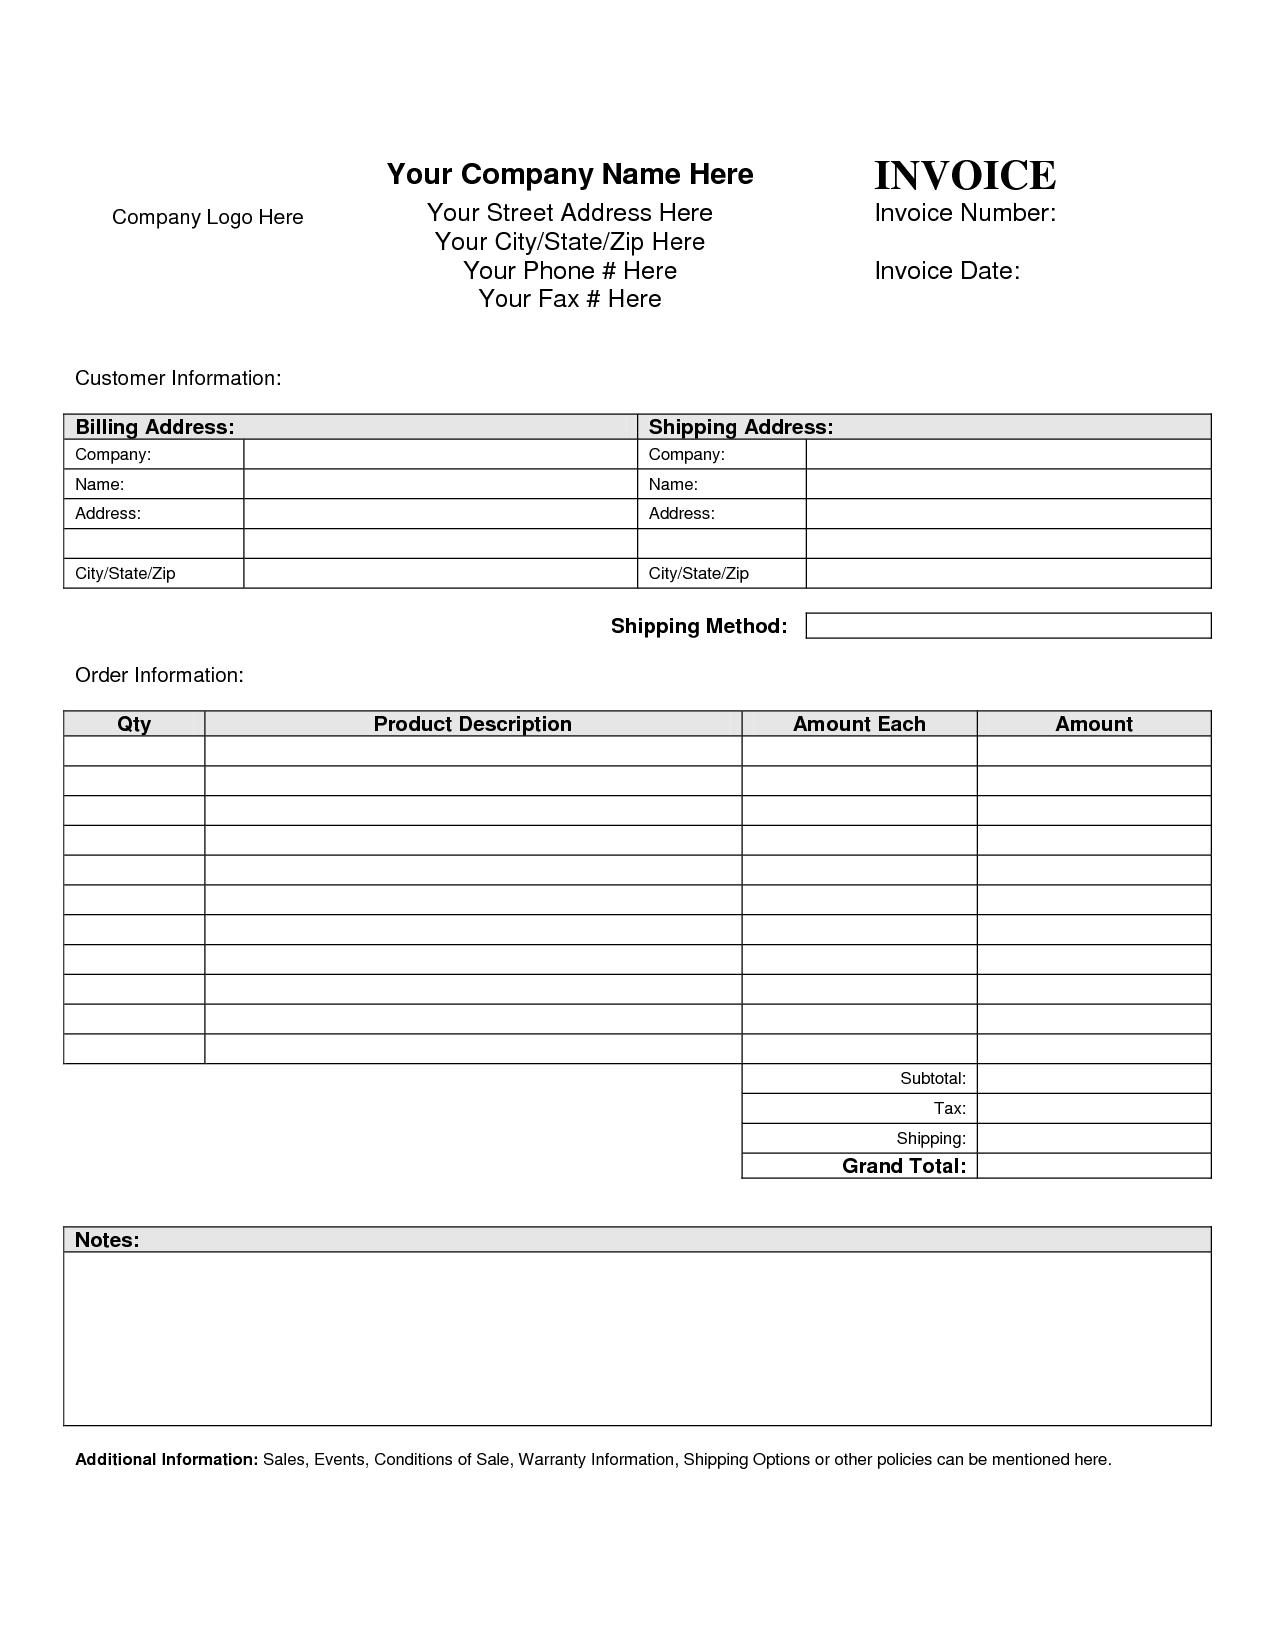 Blank Spreadsheet Template 21 Free Word Excel Pdf Official Invoice Template Invoice Template Ideas